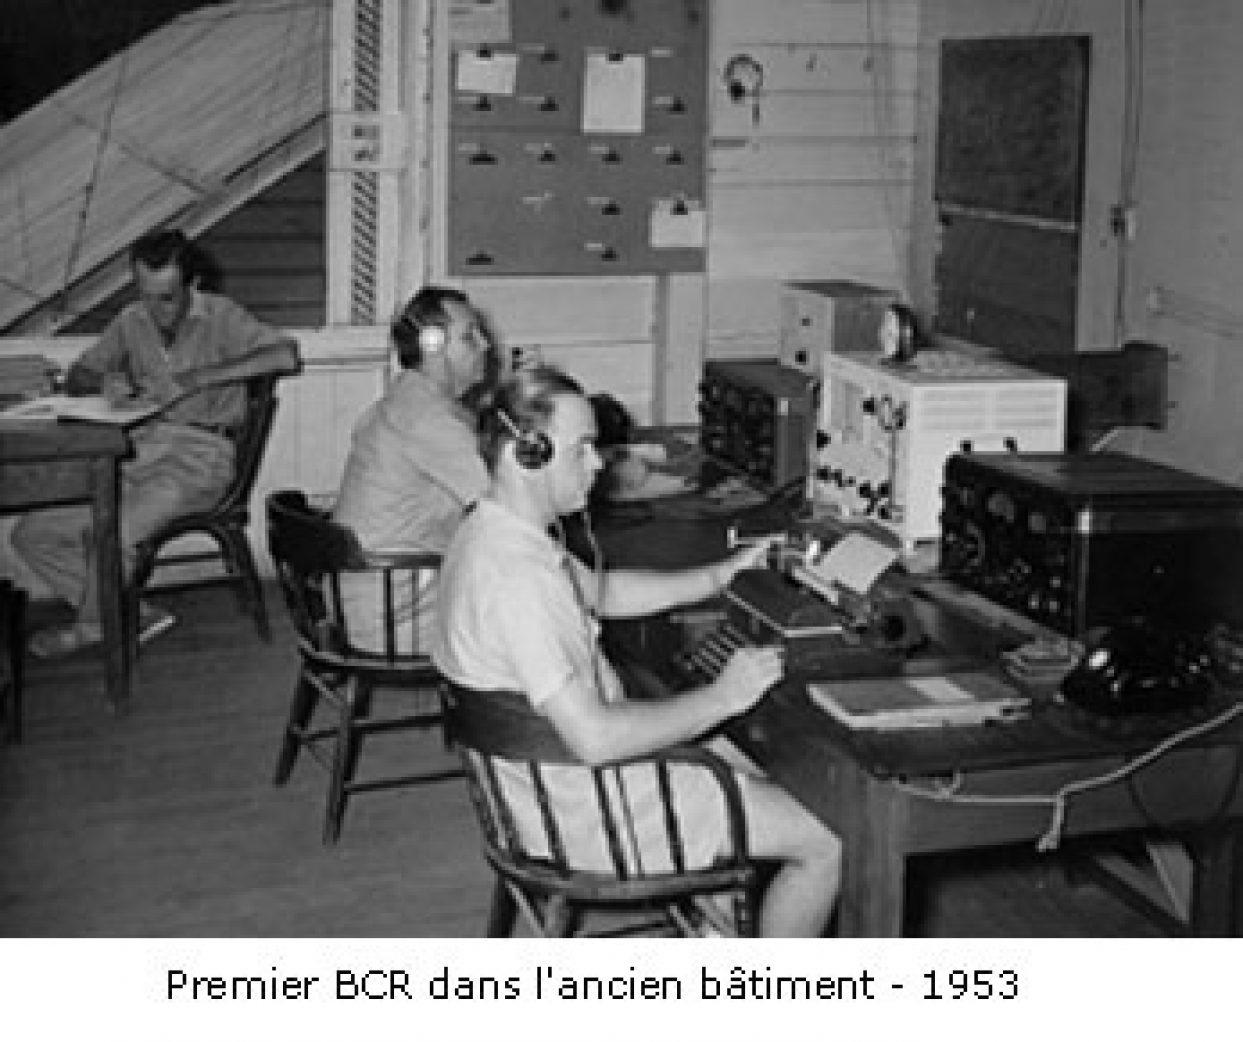 BCR_1953.jpg